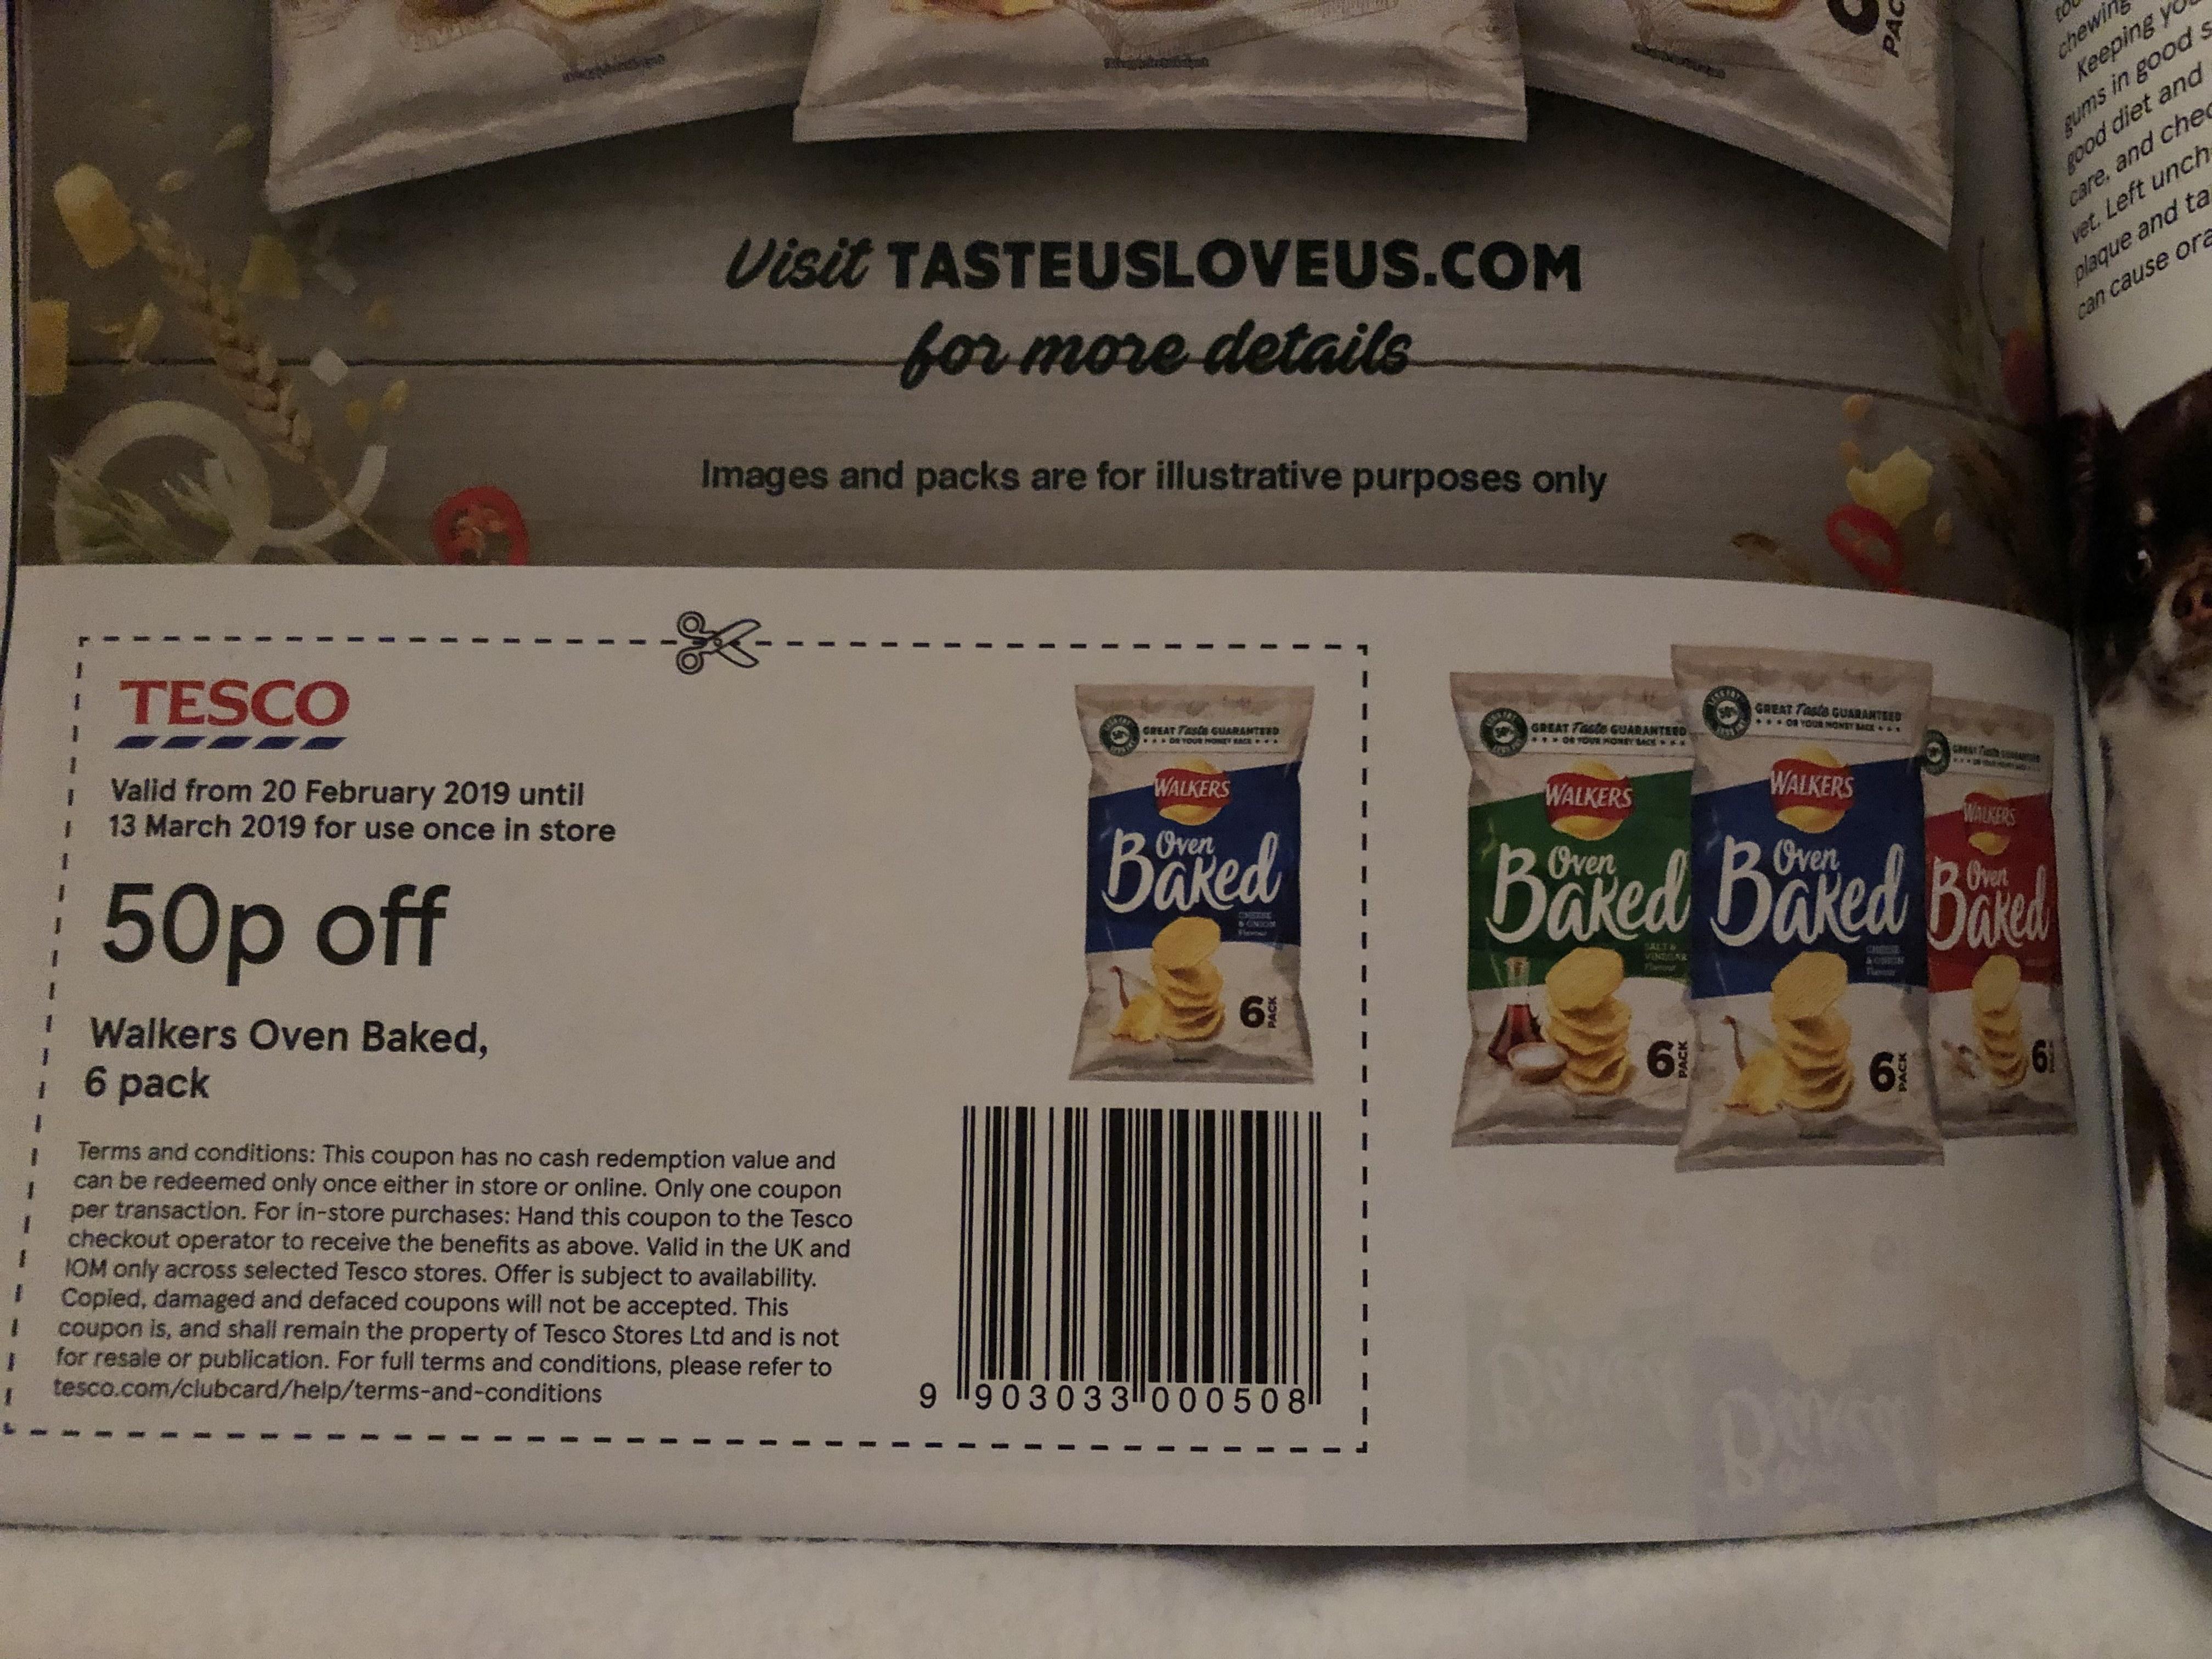 50p off walkers oven baked crisps in Tesco magazine